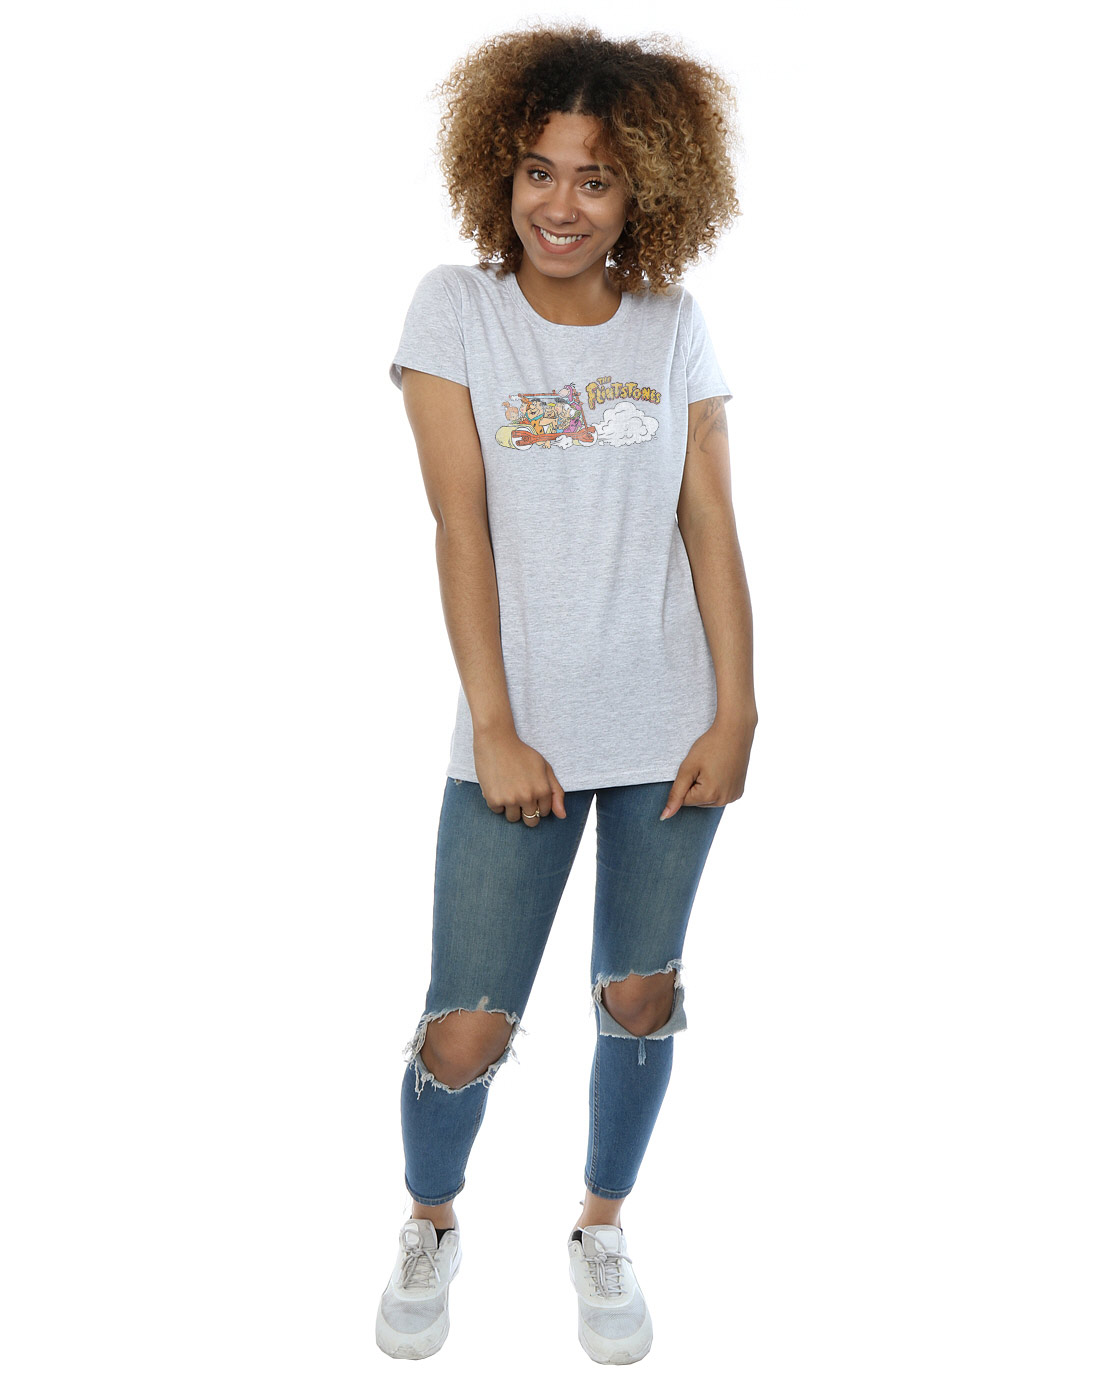 The-Flintstones-Women-039-s-Family-Car-Distressed-T-Shirt thumbnail 15